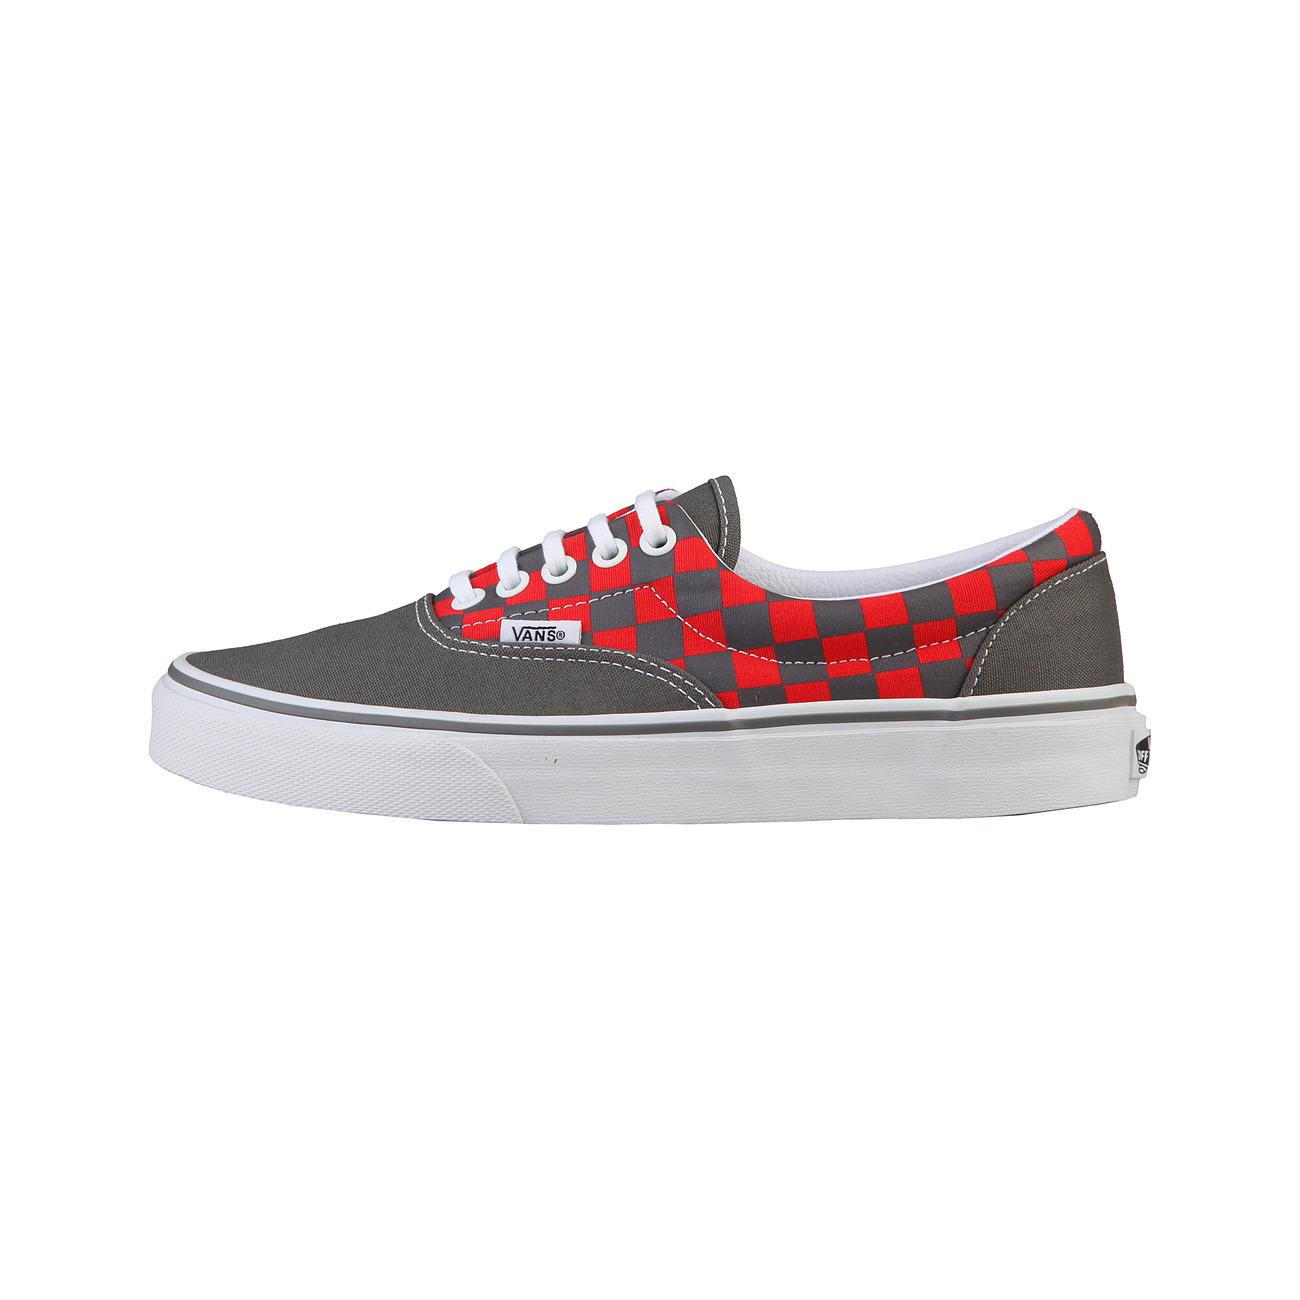 Vans Era Checkerboard Red 27f1344c08d